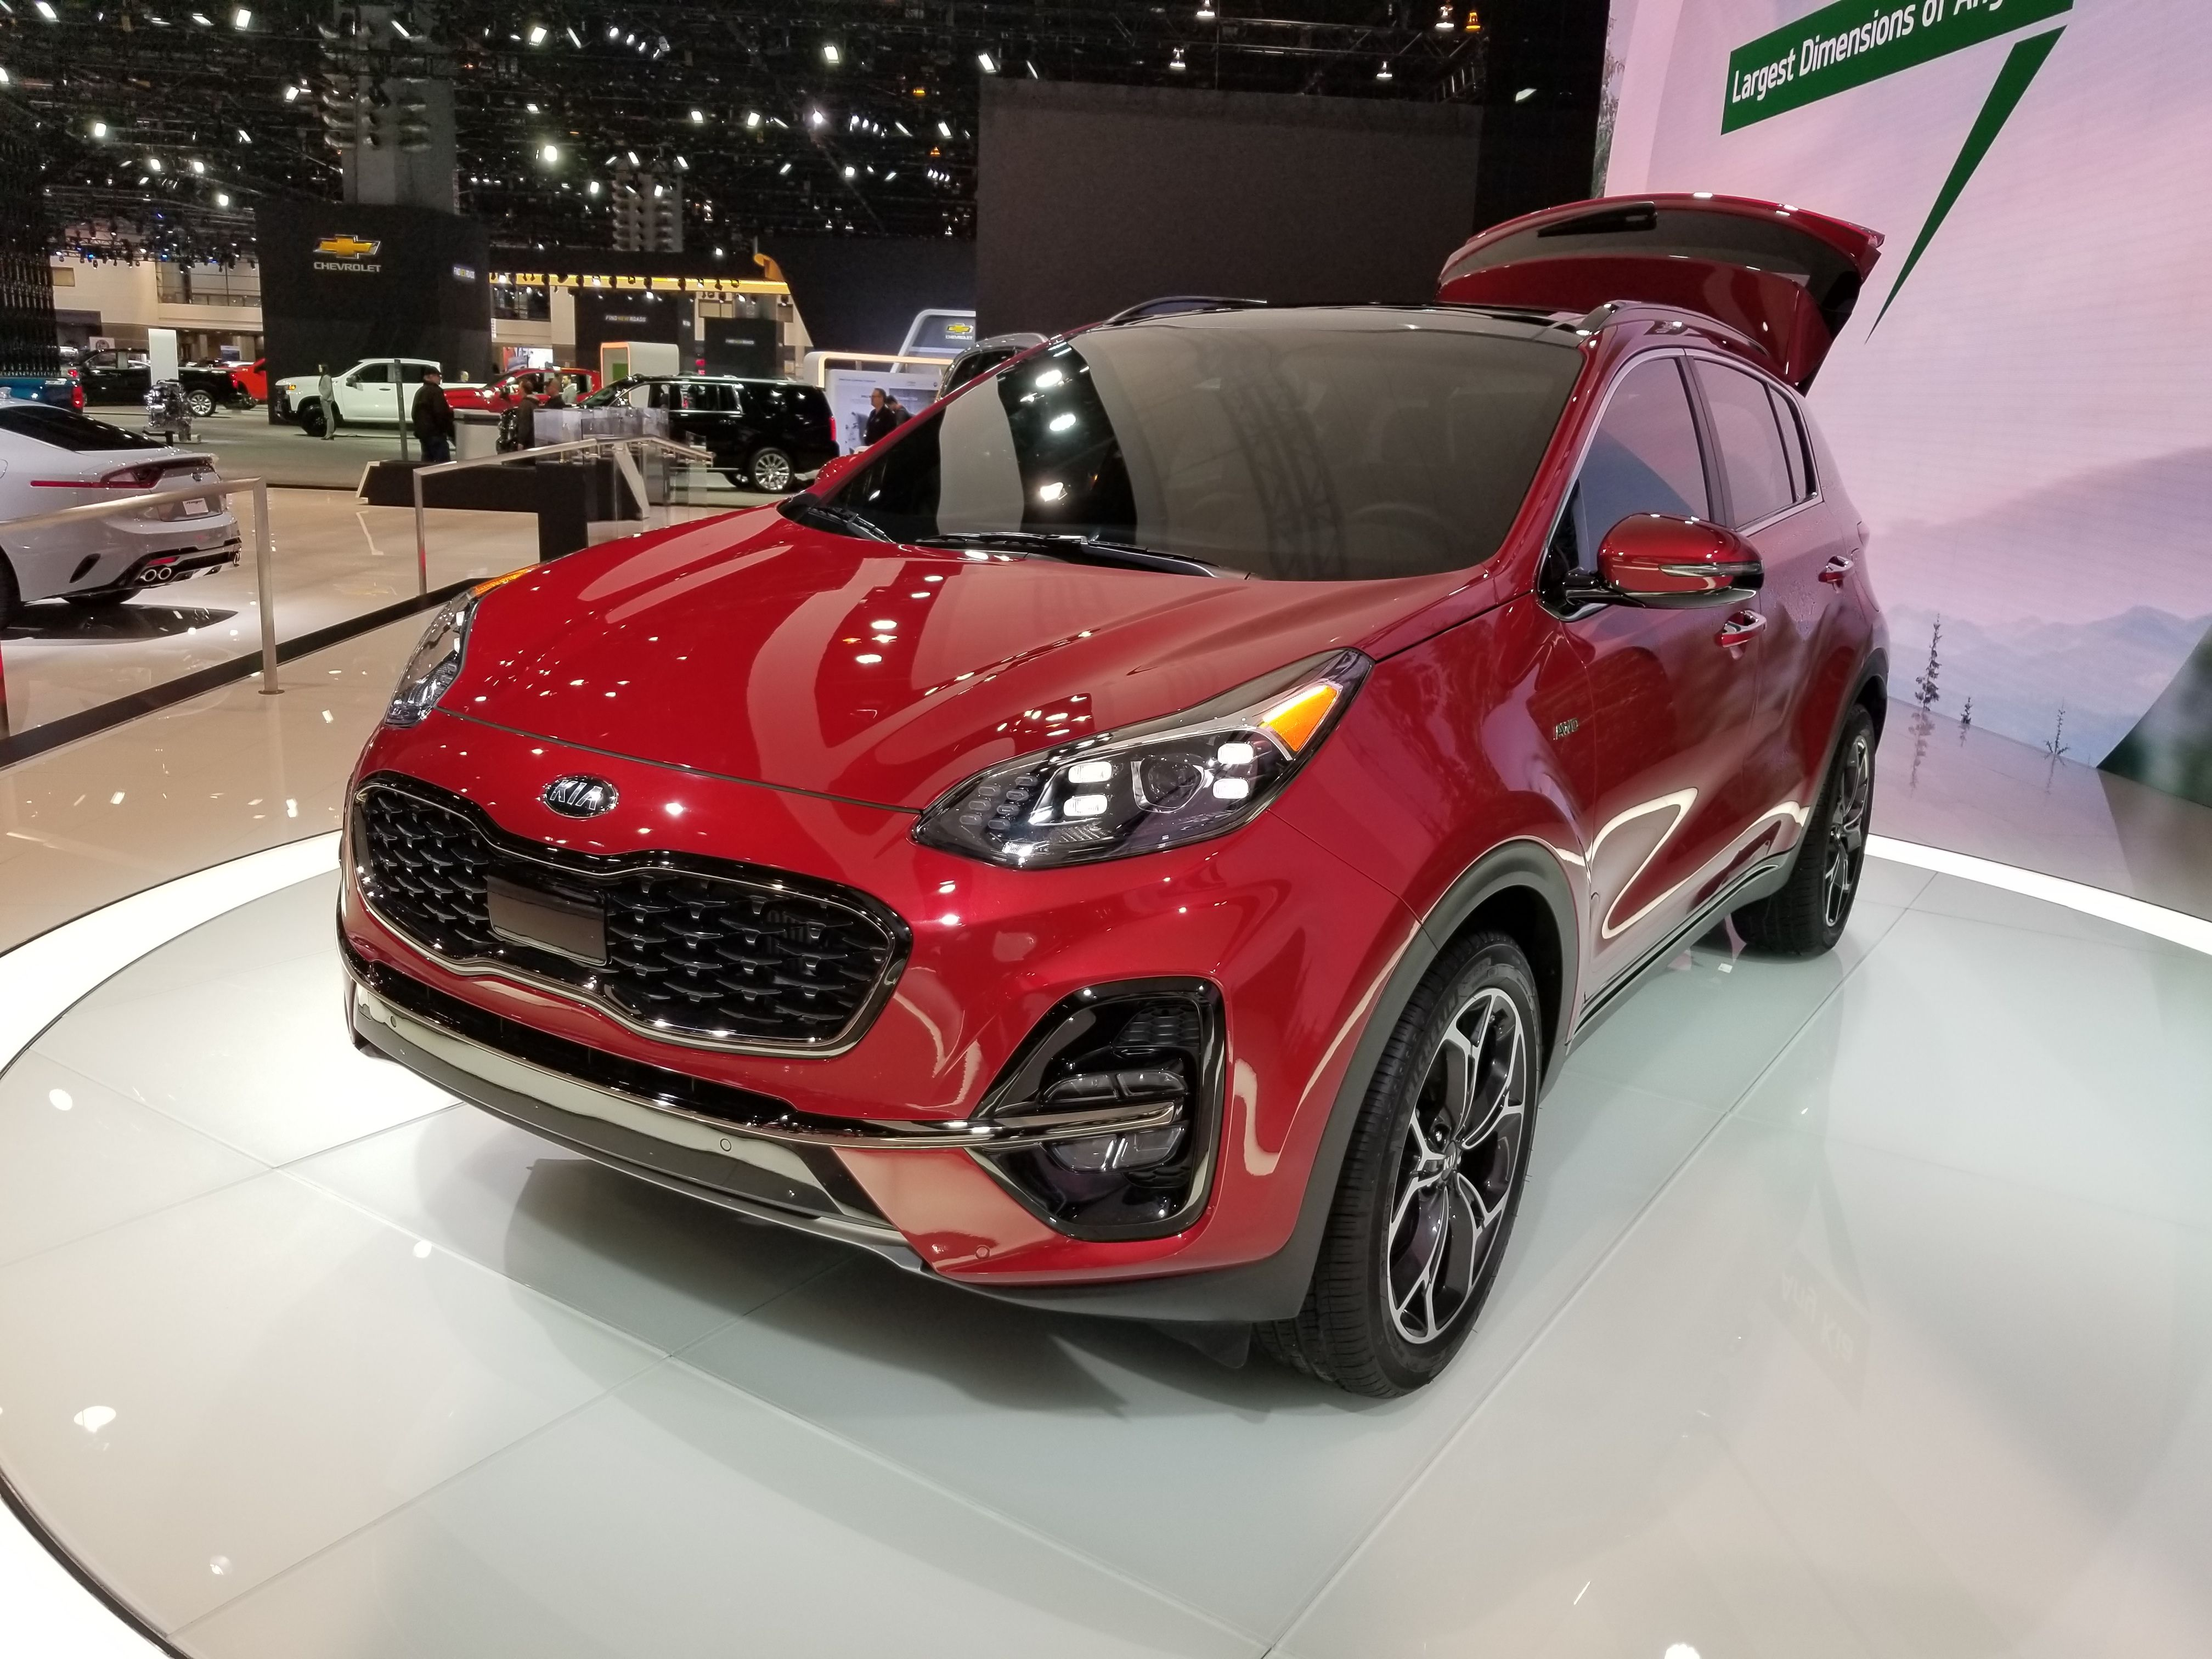 2020 Kia Sportage Revealed Without Many Meaningful Updates For A Good Reason Kia Sportage Kia Sportage